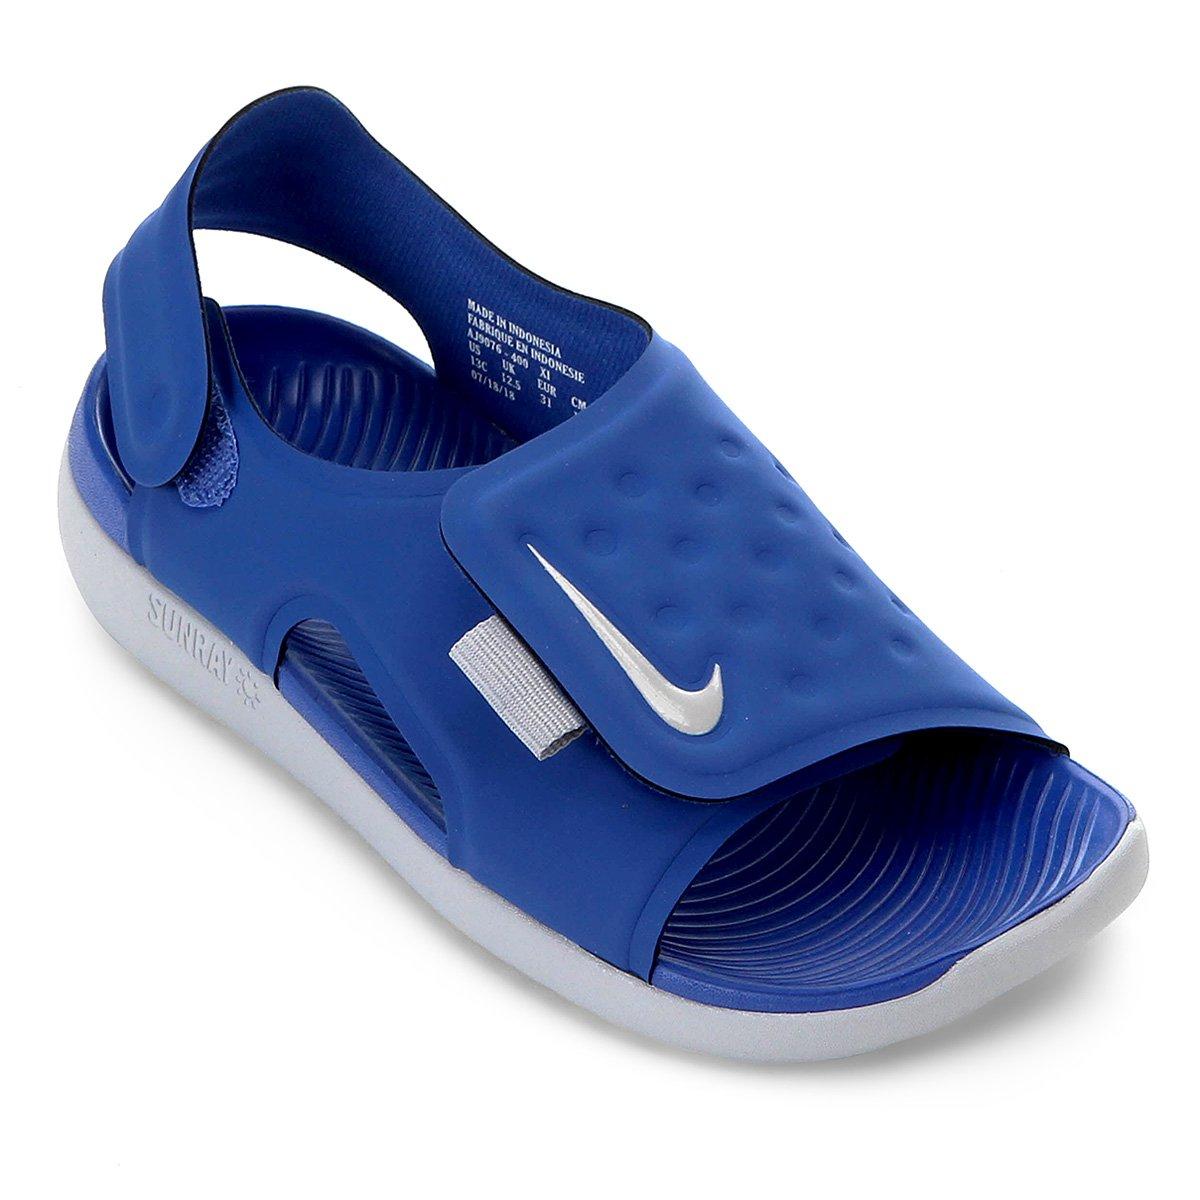 4620cb032 Sandália Infantil Nike Sunray Adjust 5